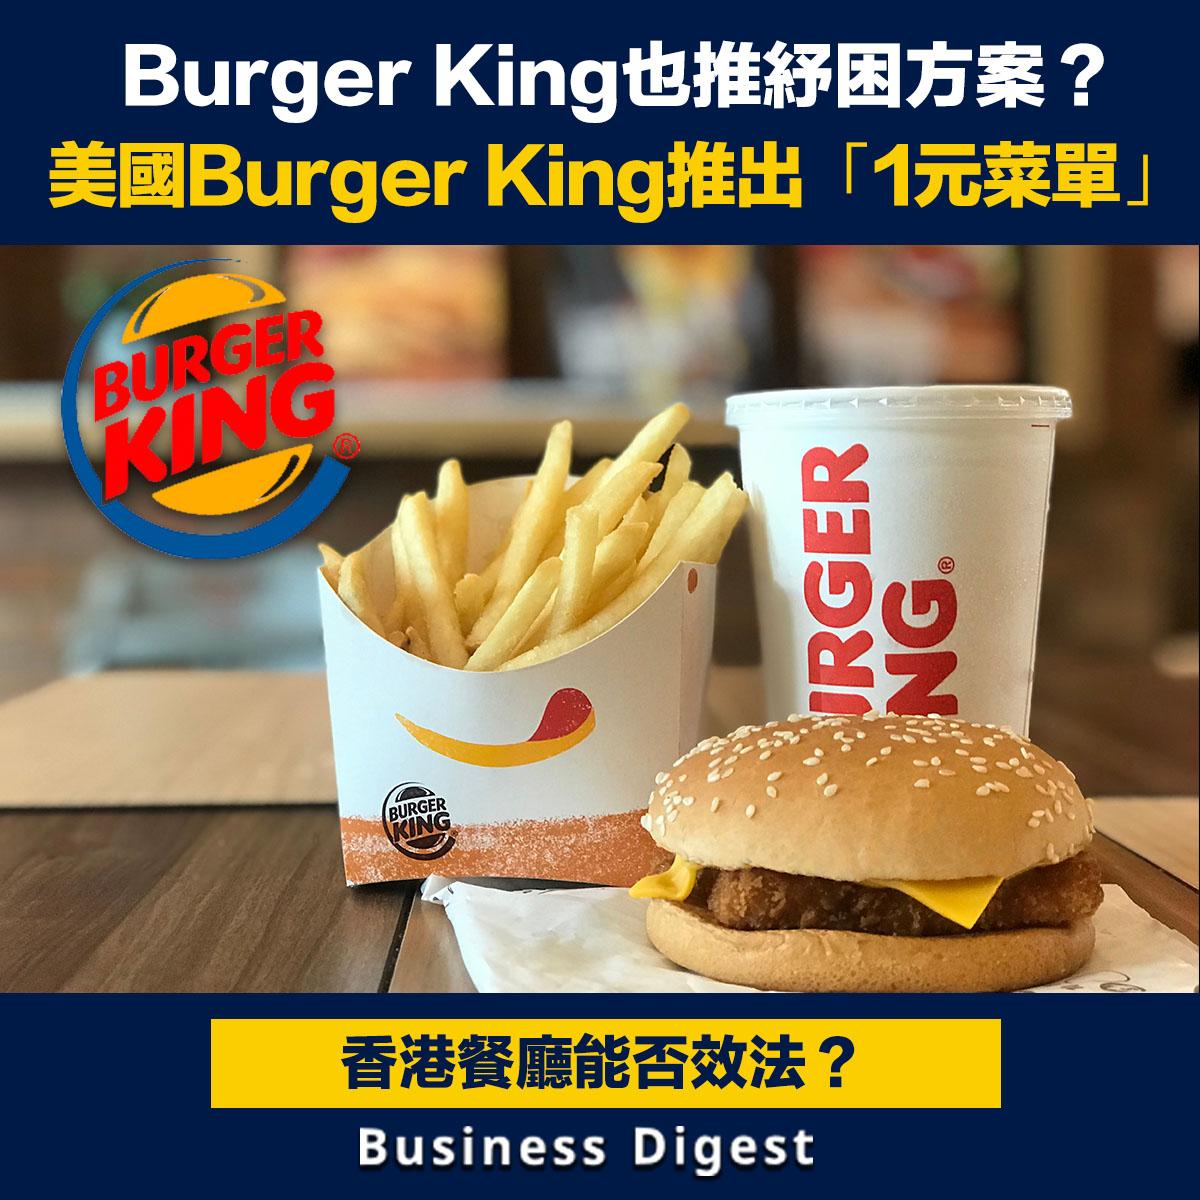 Burger King也推紓困方案?美國Burger King推出「1元菜單」